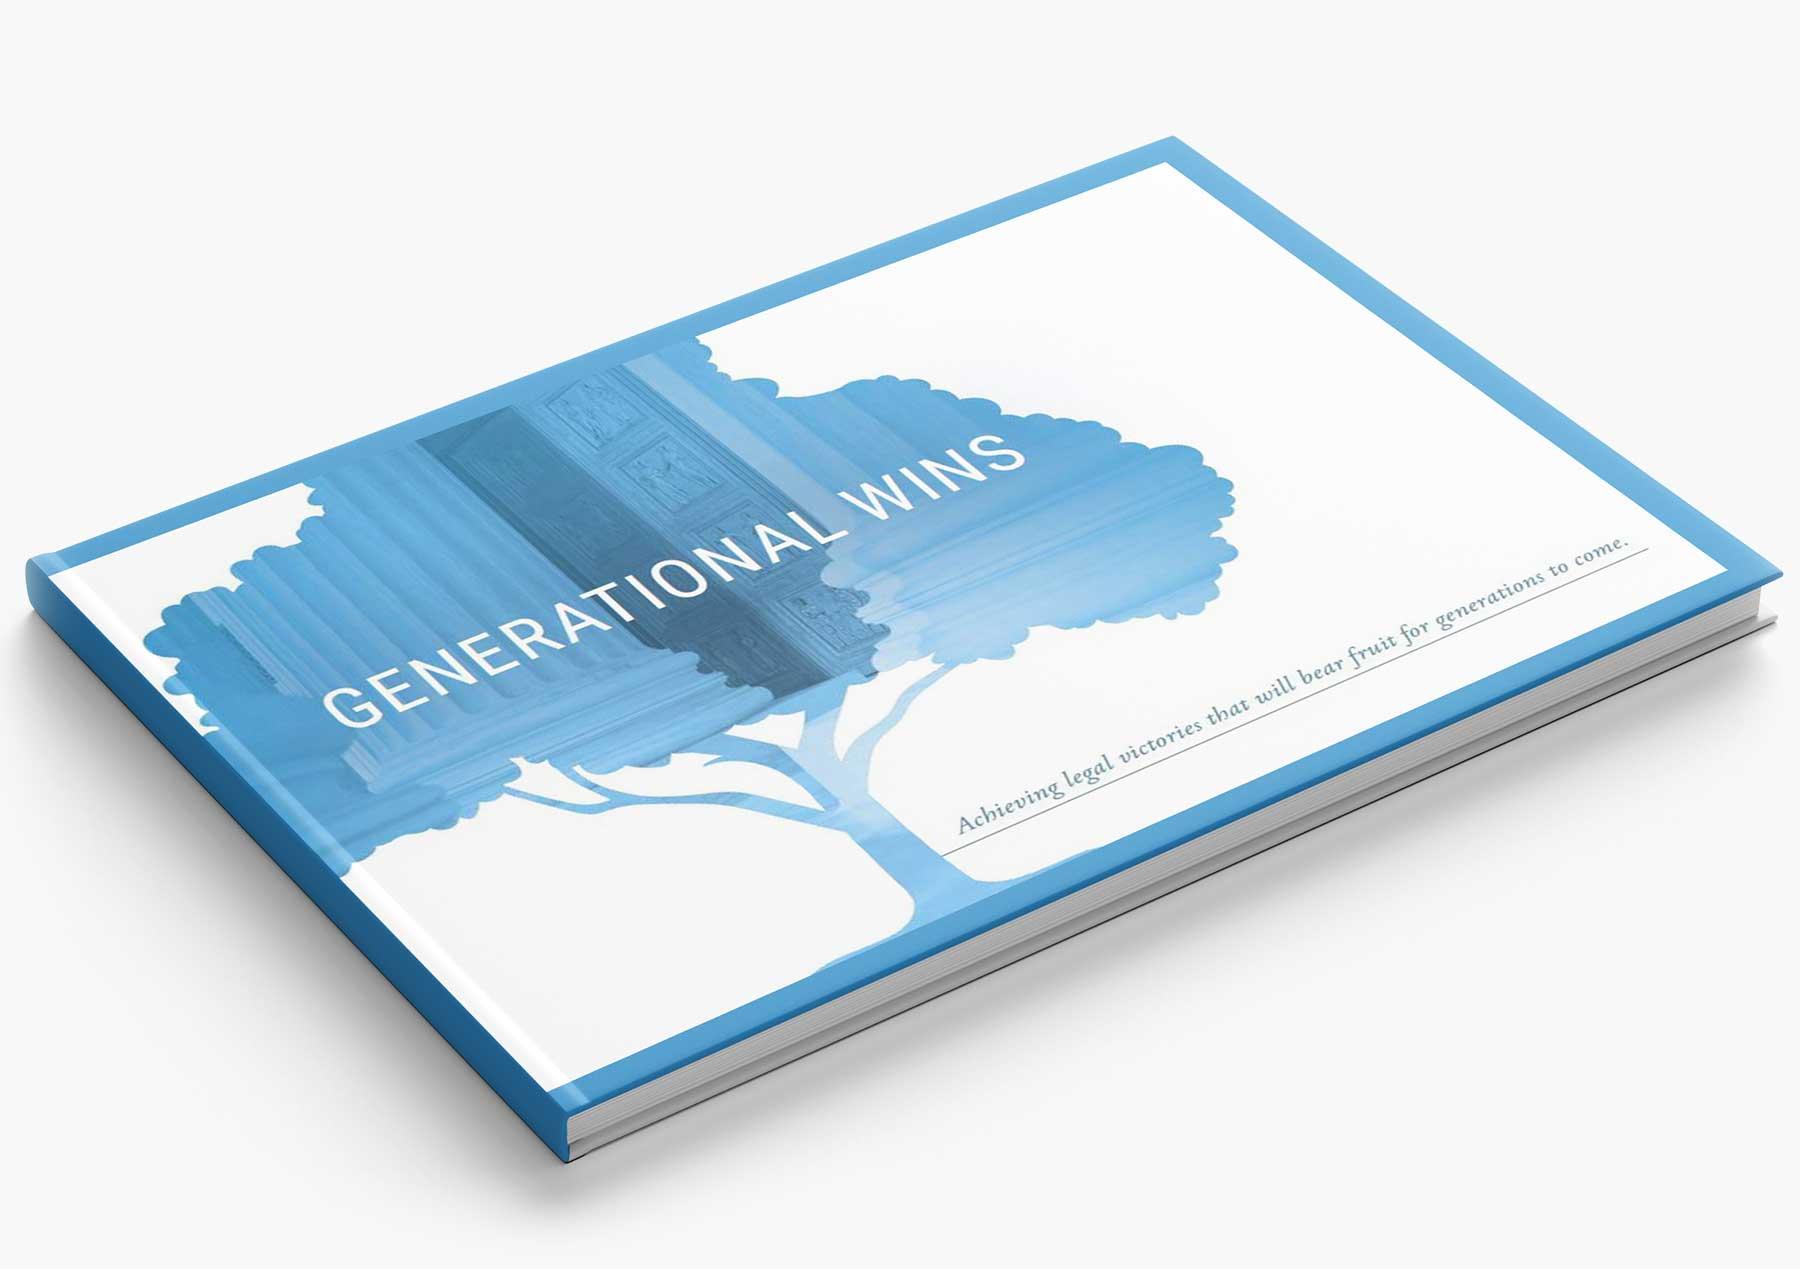 Generational Wins Ebook